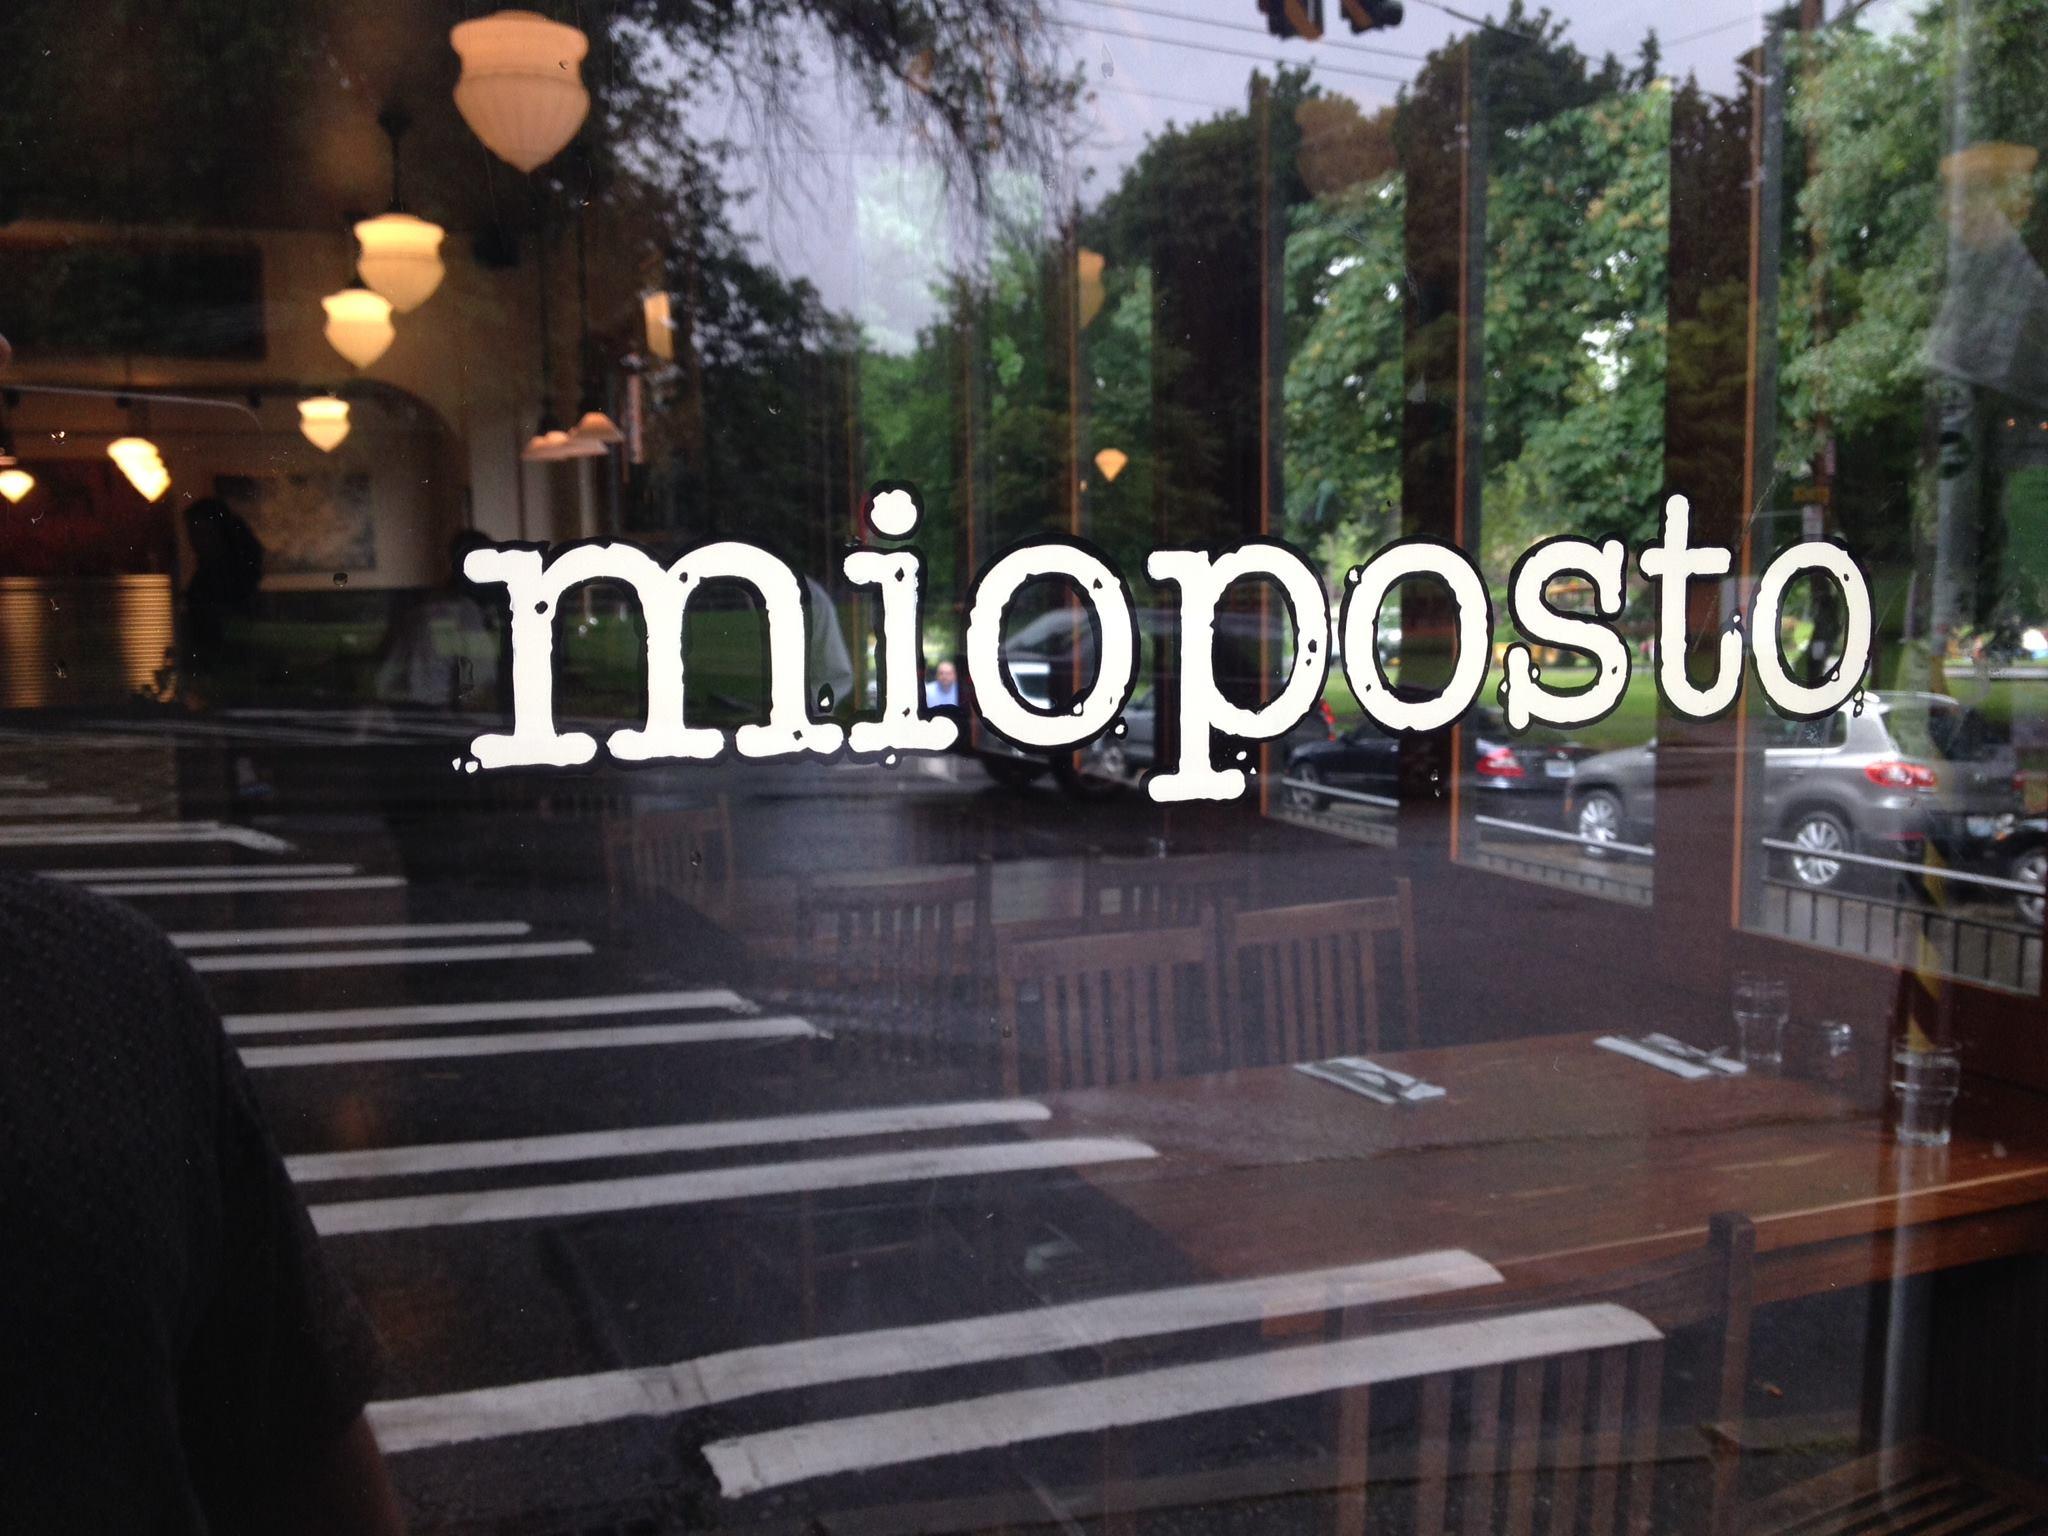 Mioposto will open its third restaurant in West Seattle August 6.